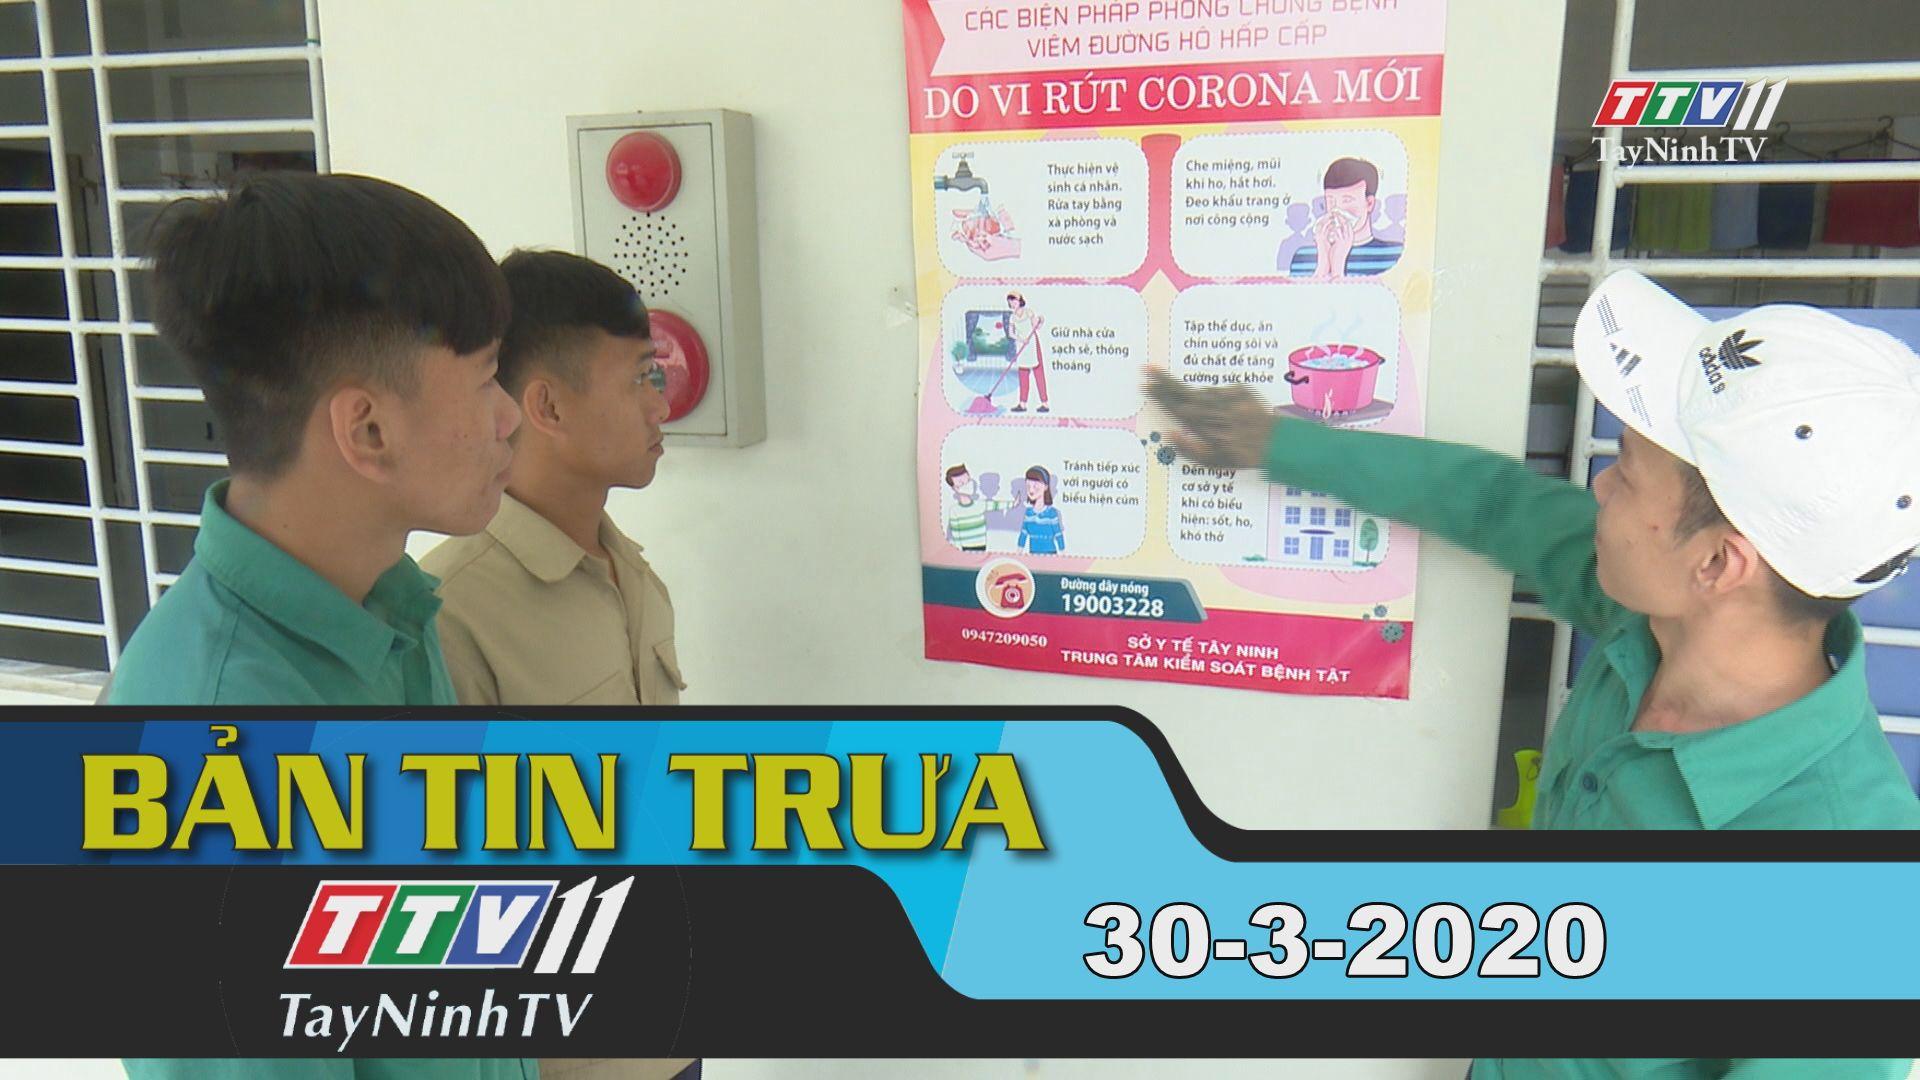 Bản tin trưa 30-3-2020 | Tin tức hôm nay | TayNinhTV